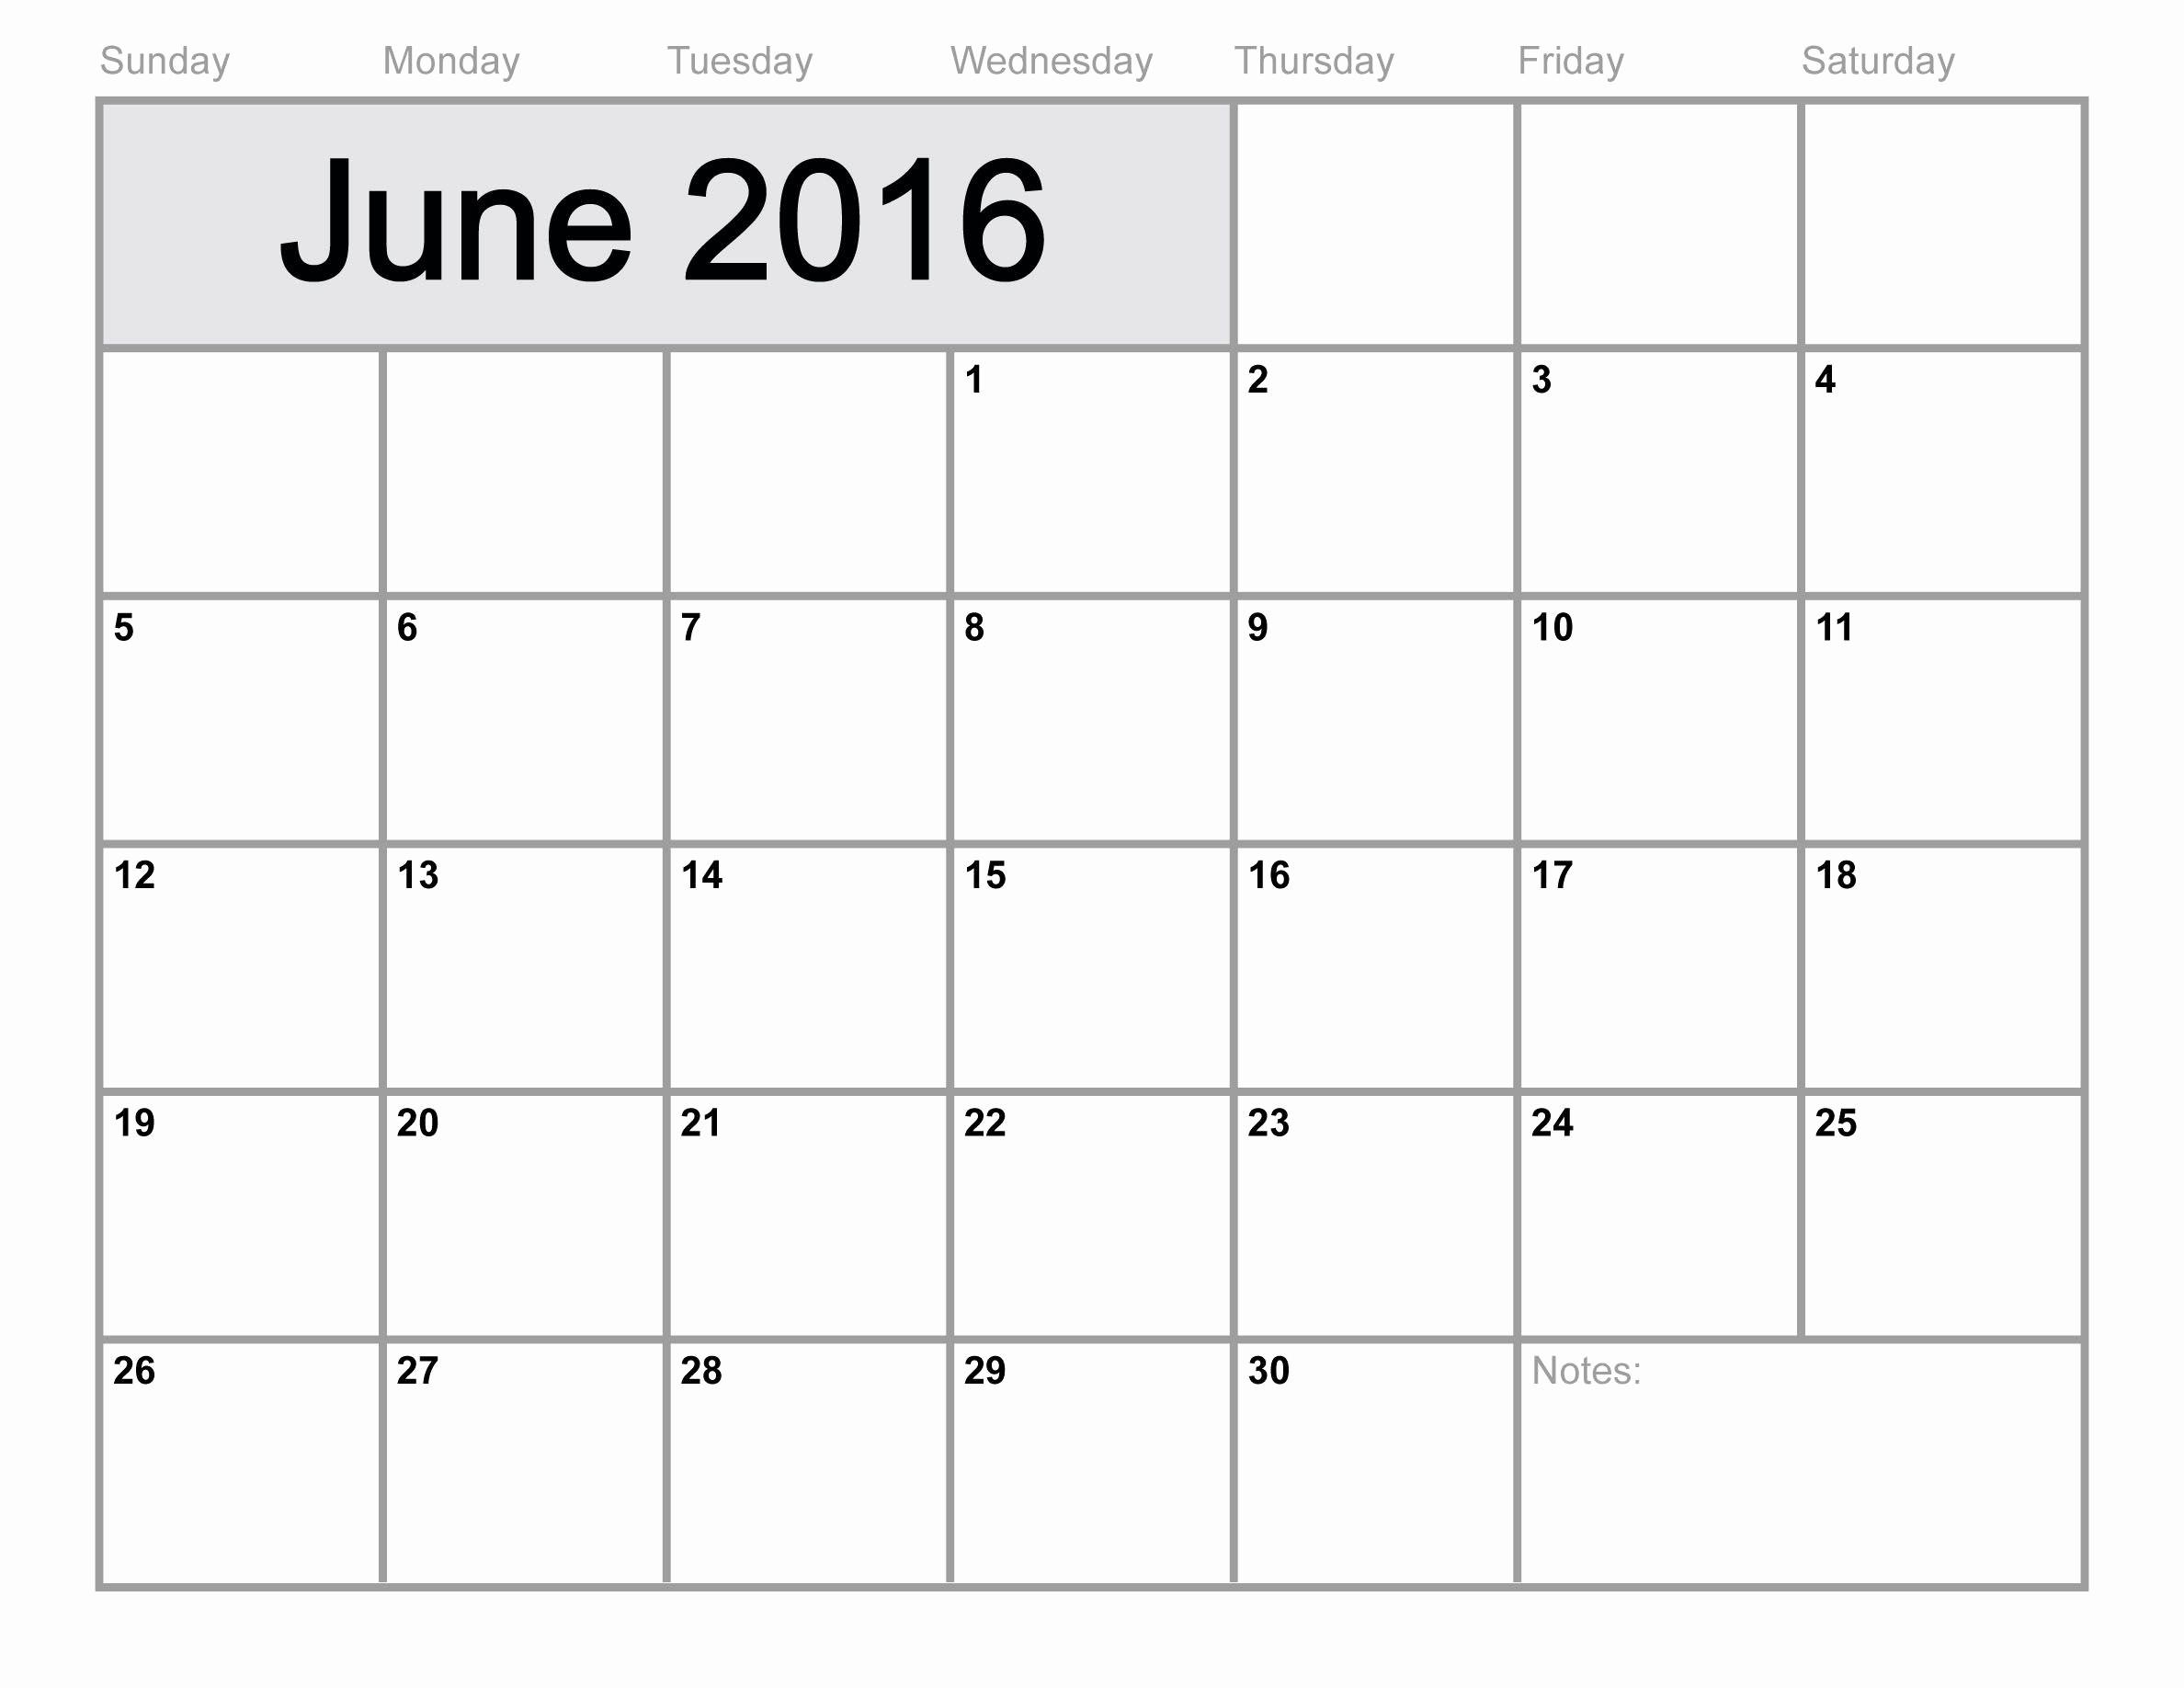 Printable Blank Monthly Calendar Template Best Of June 2016 Calendar Printable Monthly Blank Calendar 2016